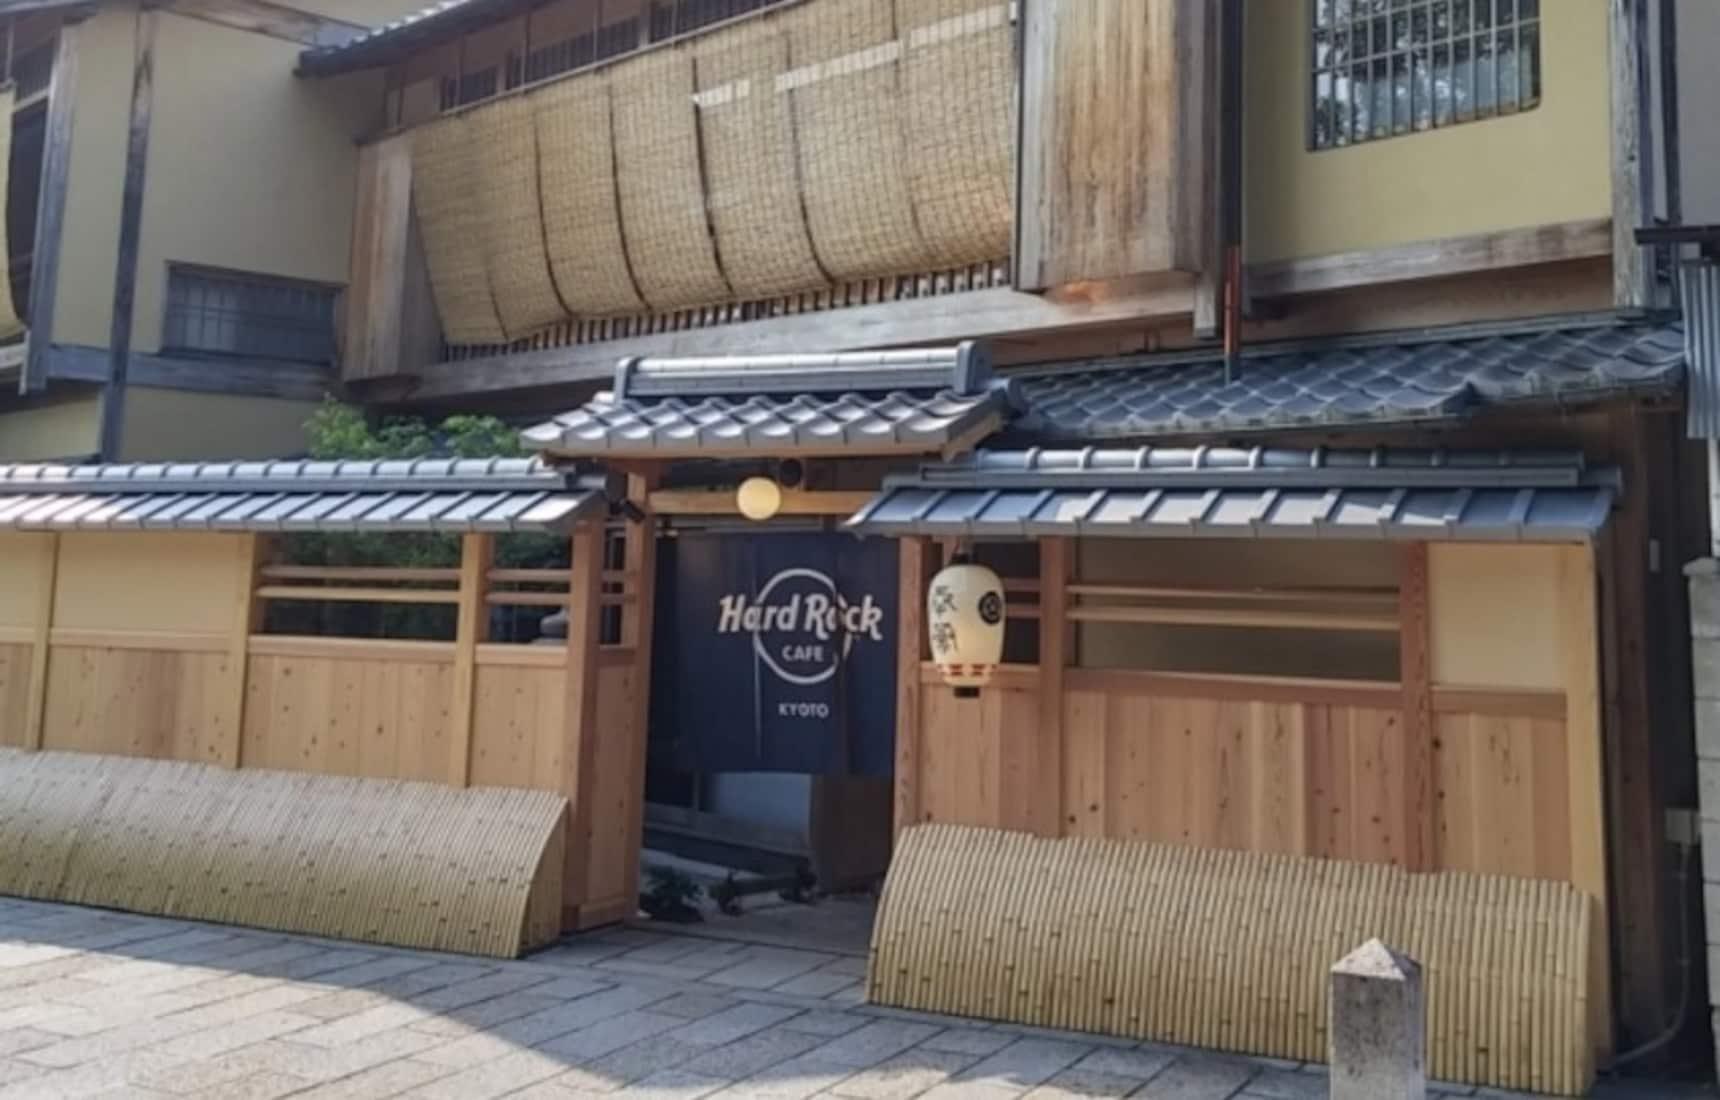 Kyoto Gets a Rockin' New Restaurant